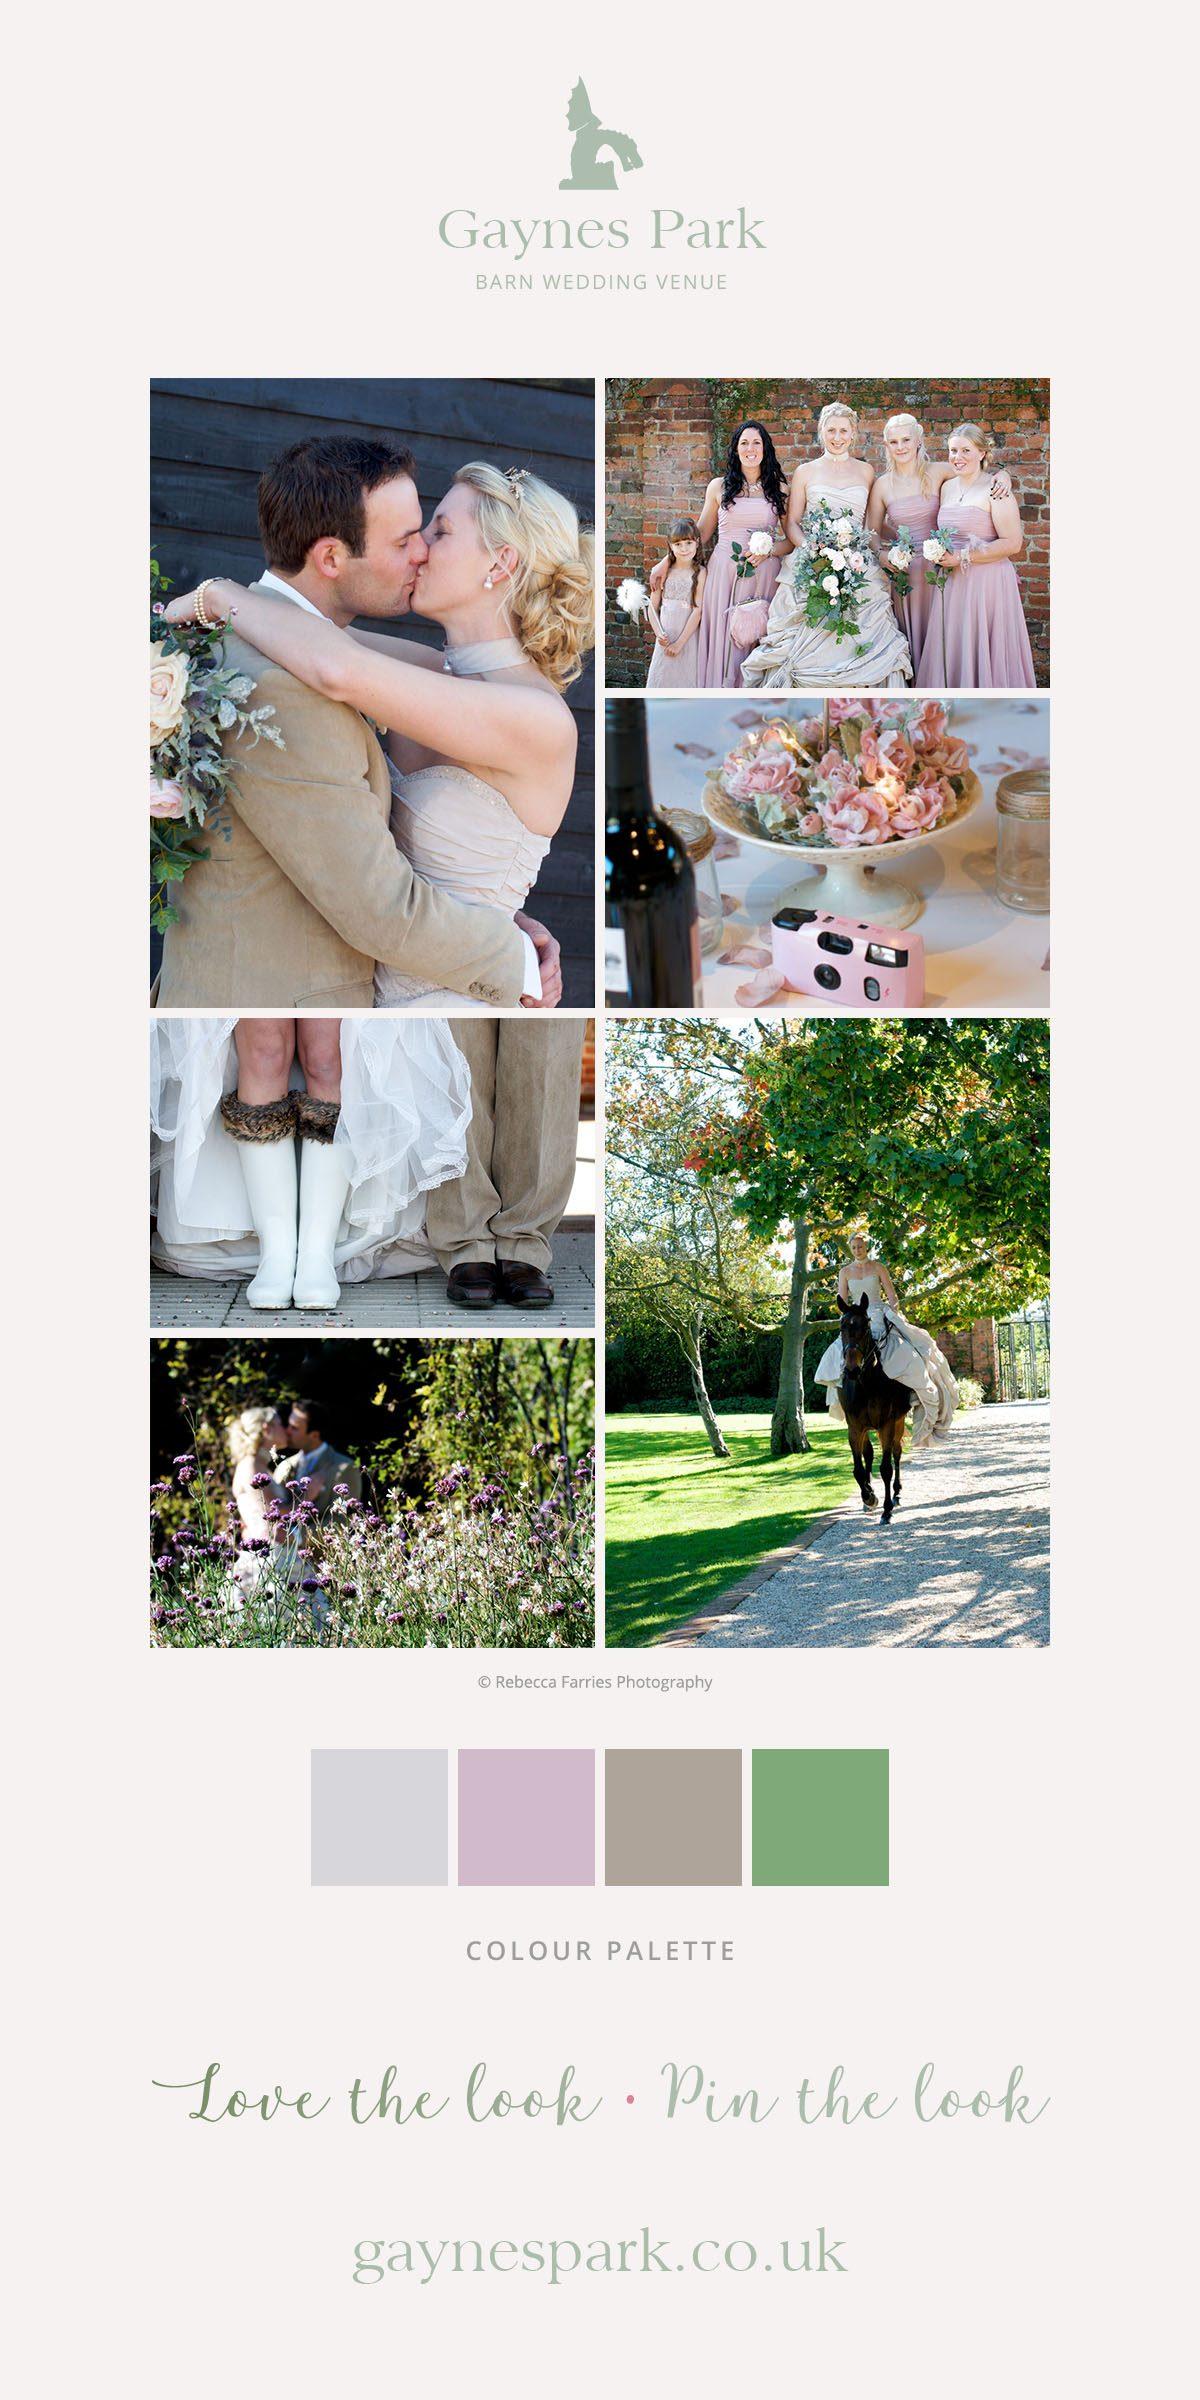 Rachael and Luke's real life wedding at Gaynes Park